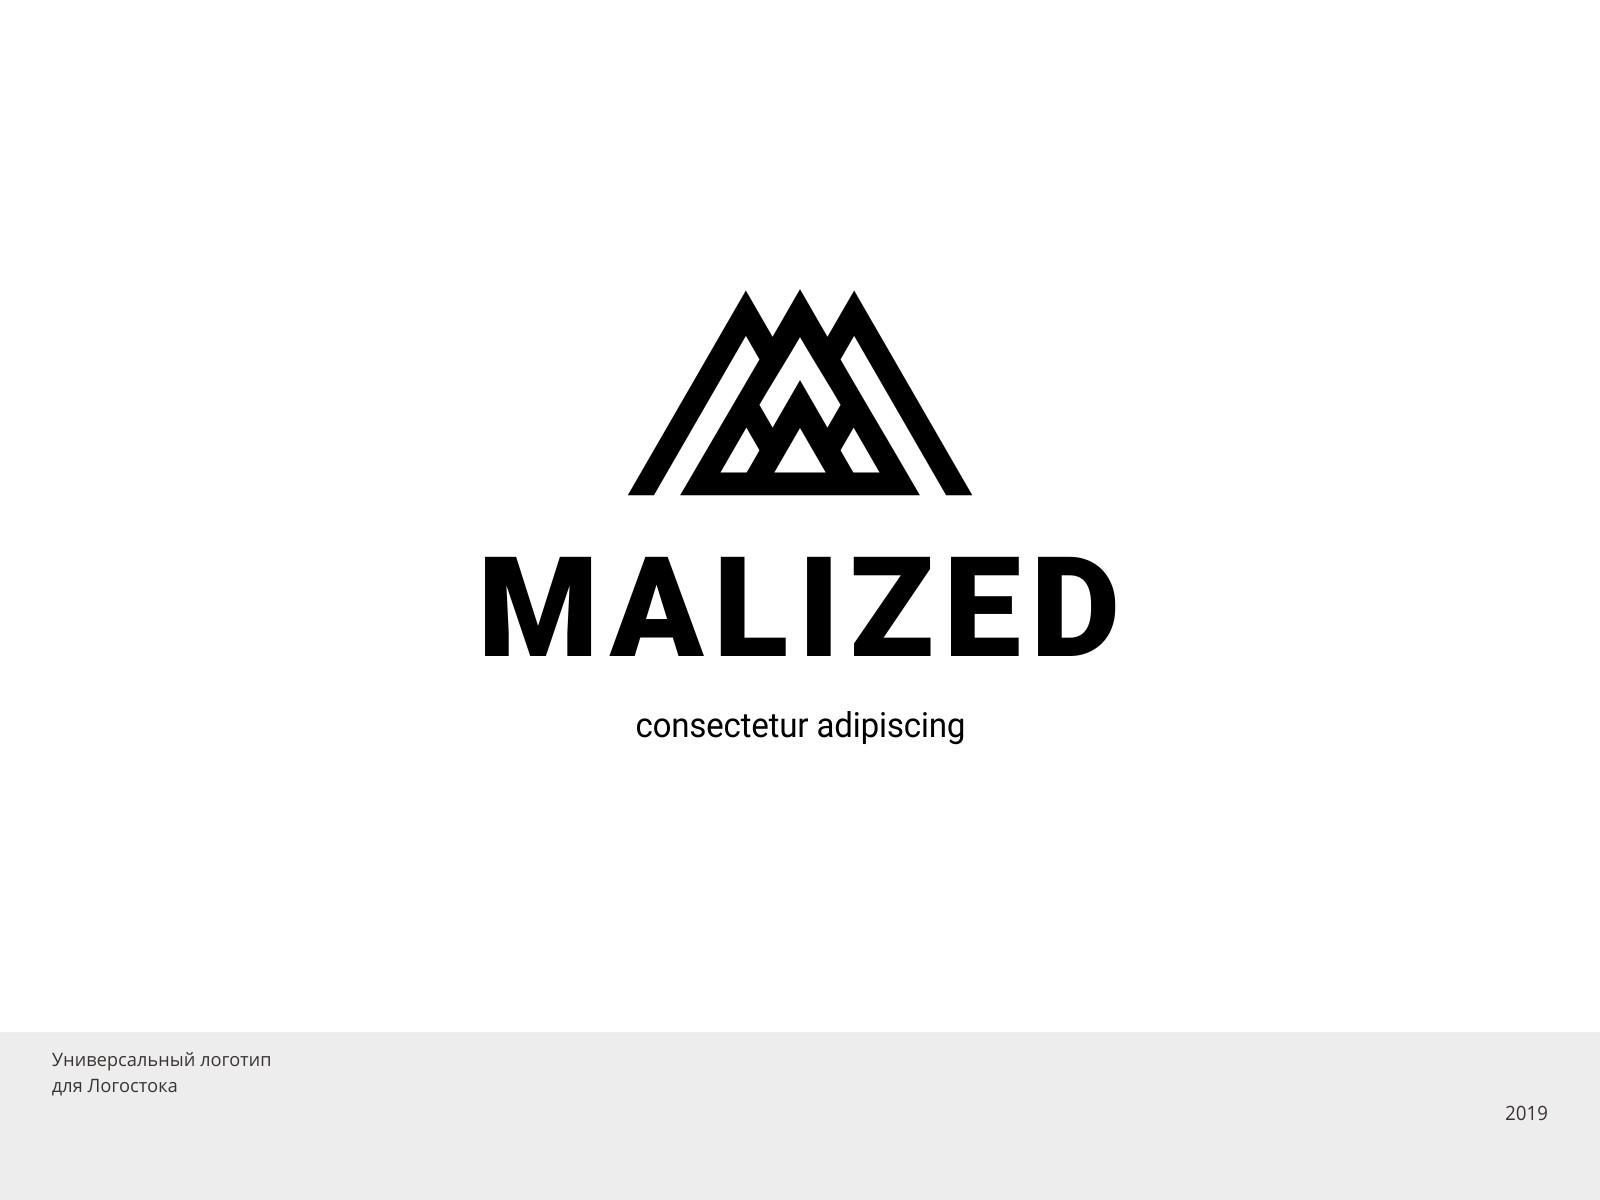 Логотип Malized